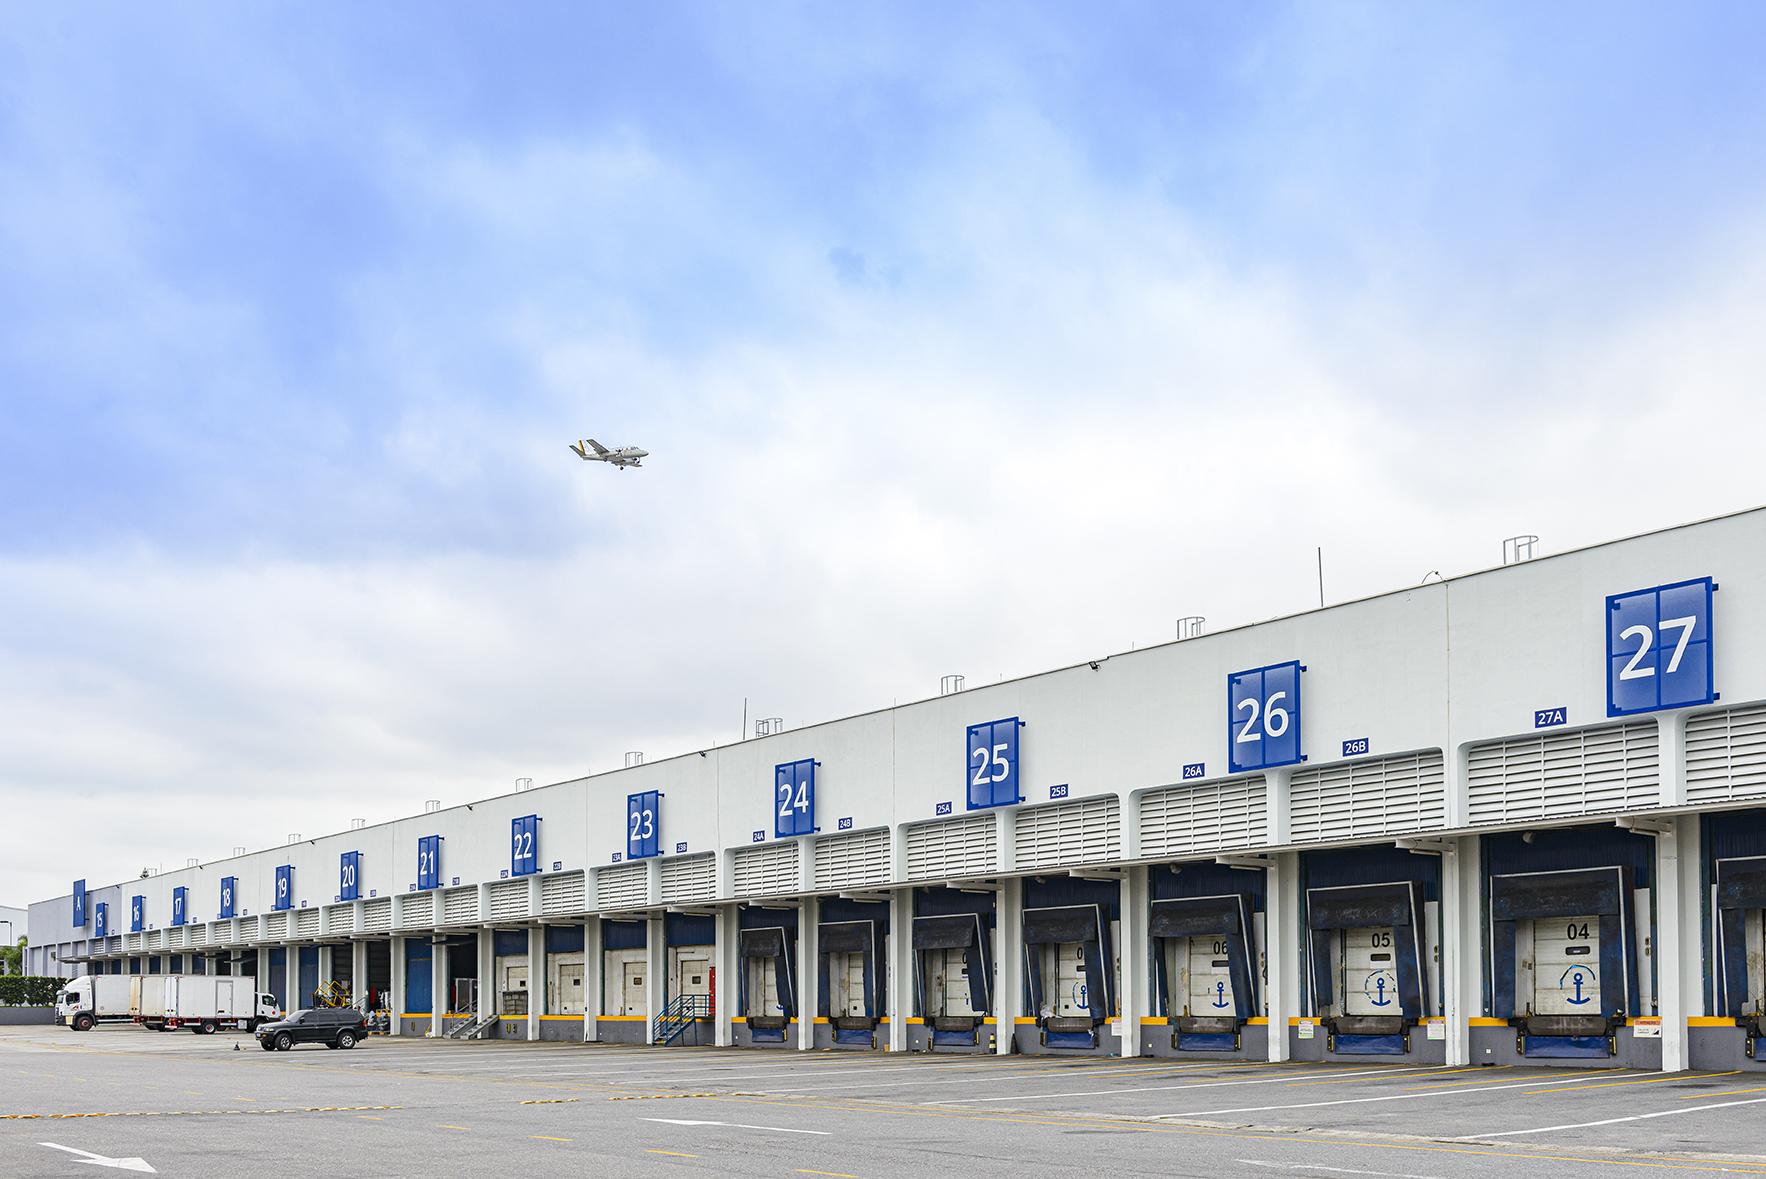 A large logistics property in Brazil